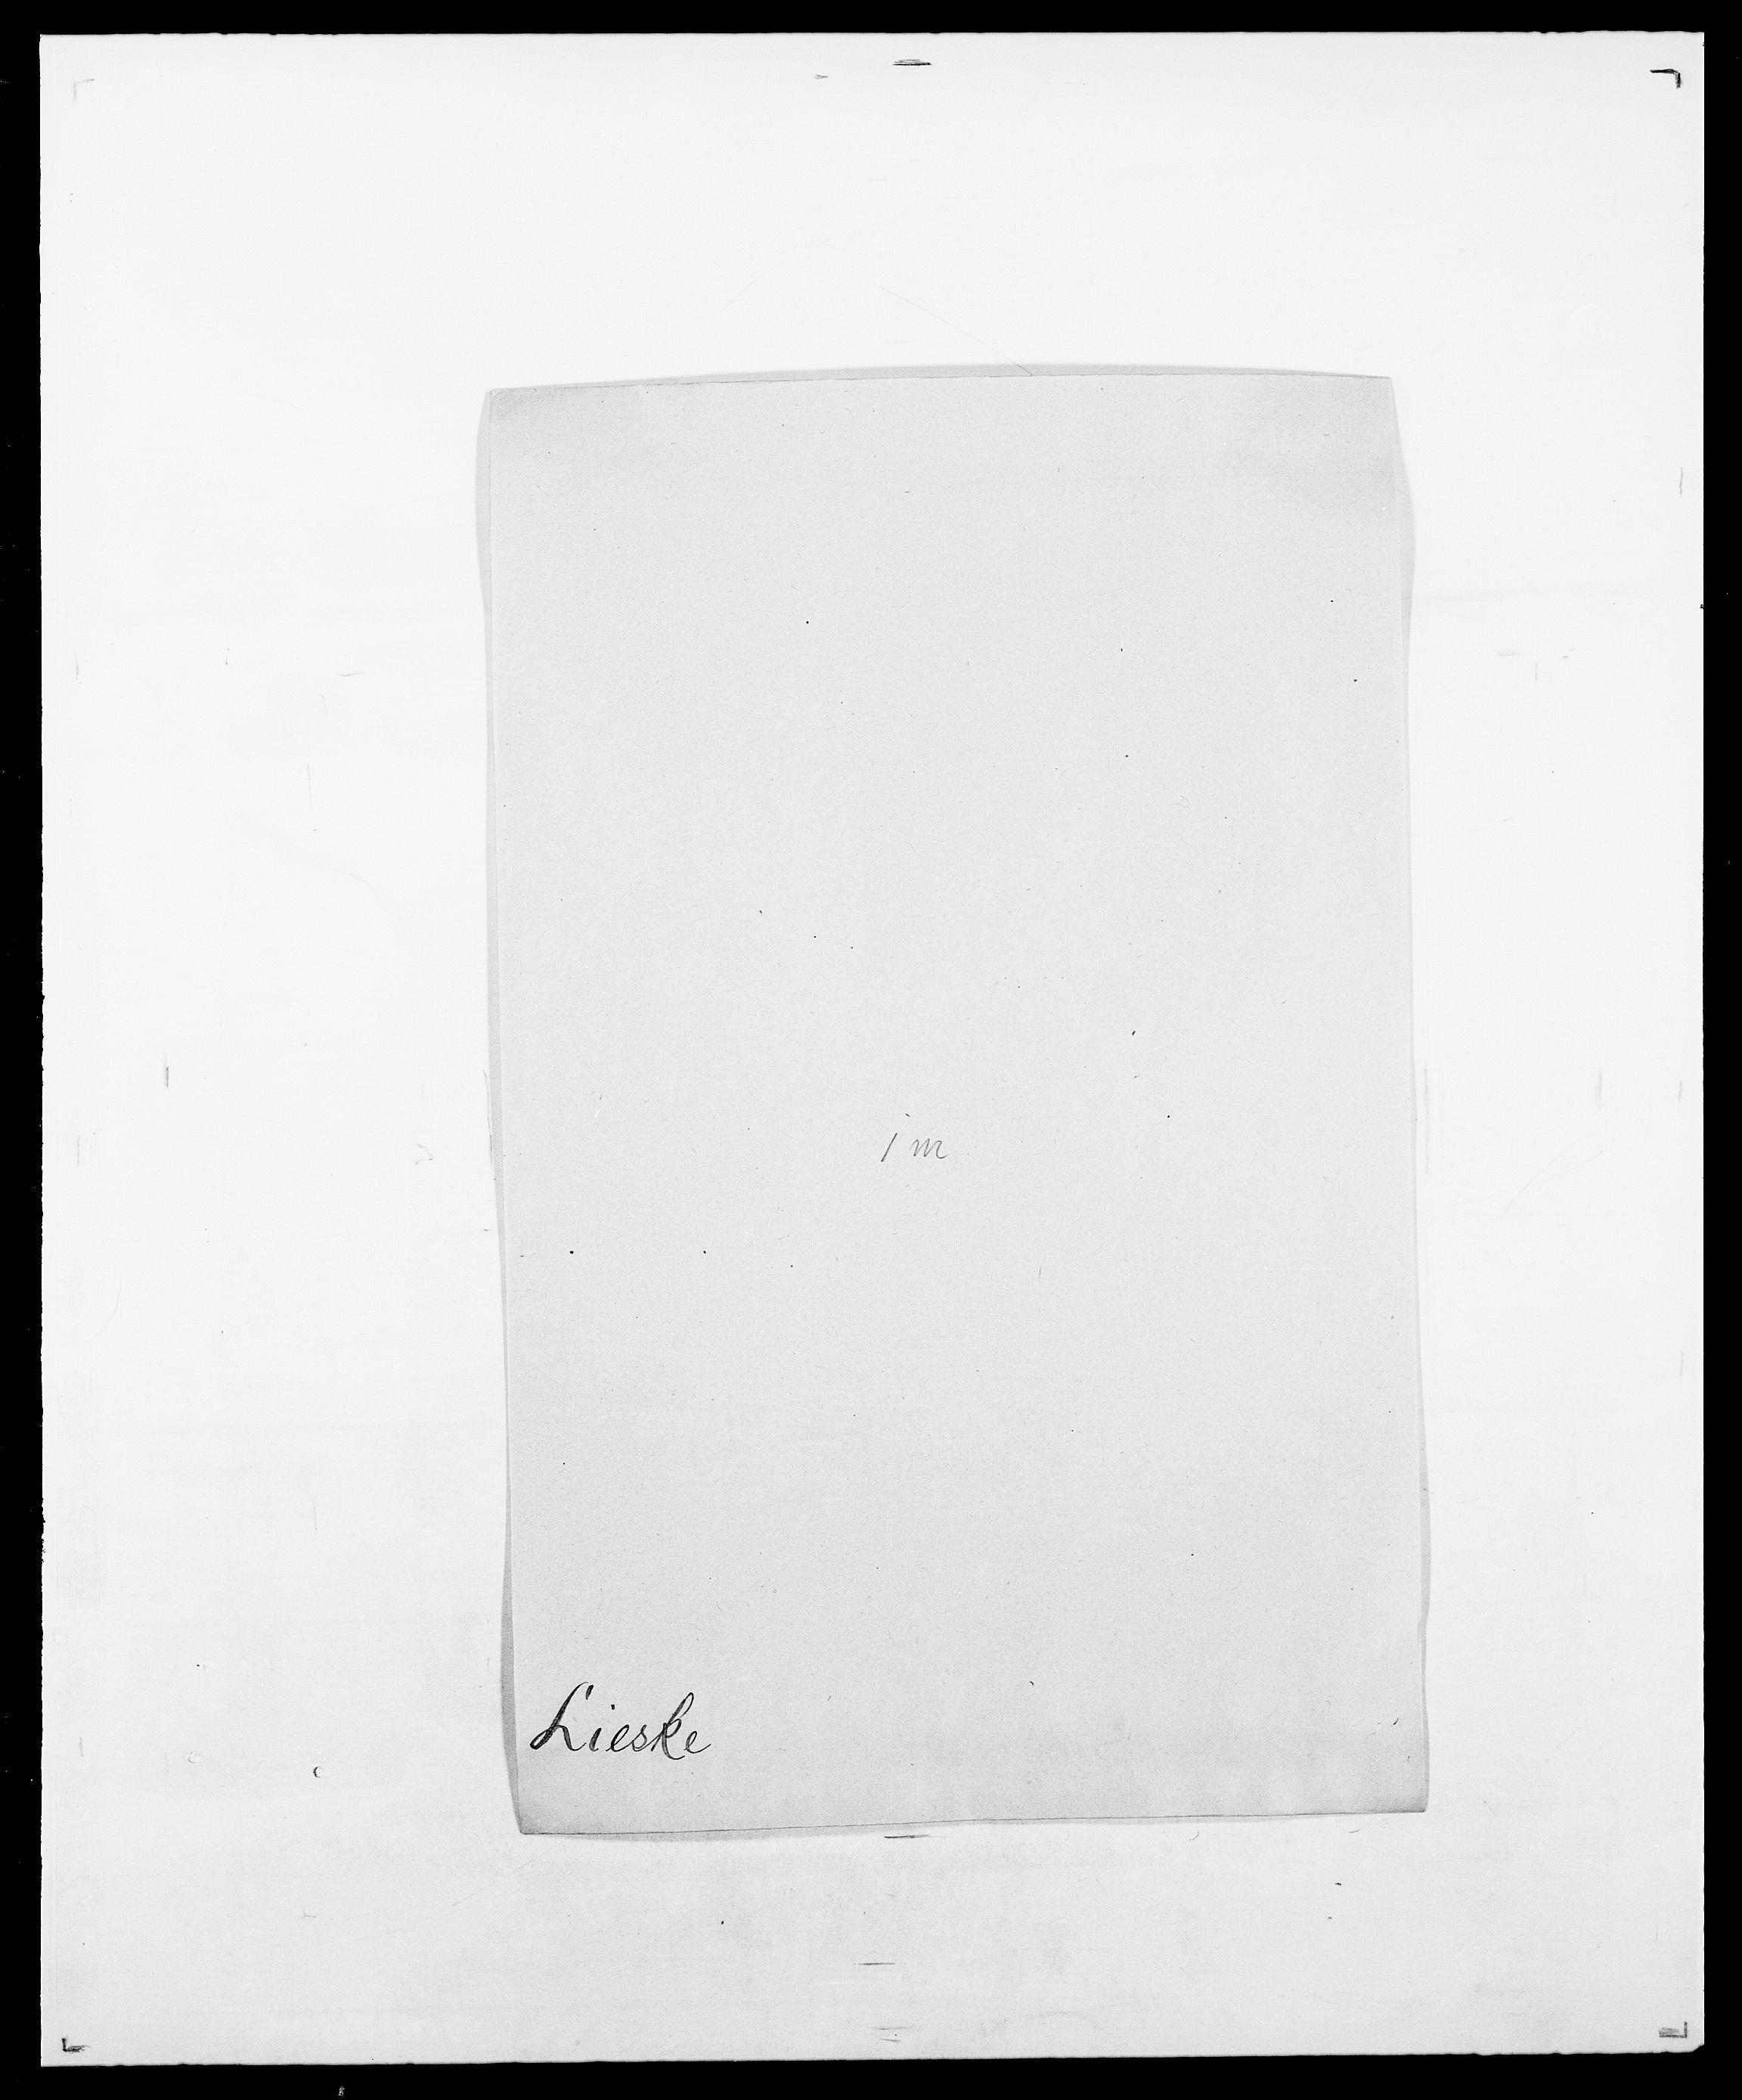 SAO, Delgobe, Charles Antoine - samling, D/Da/L0023: Lau - Lirvyn, s. 371